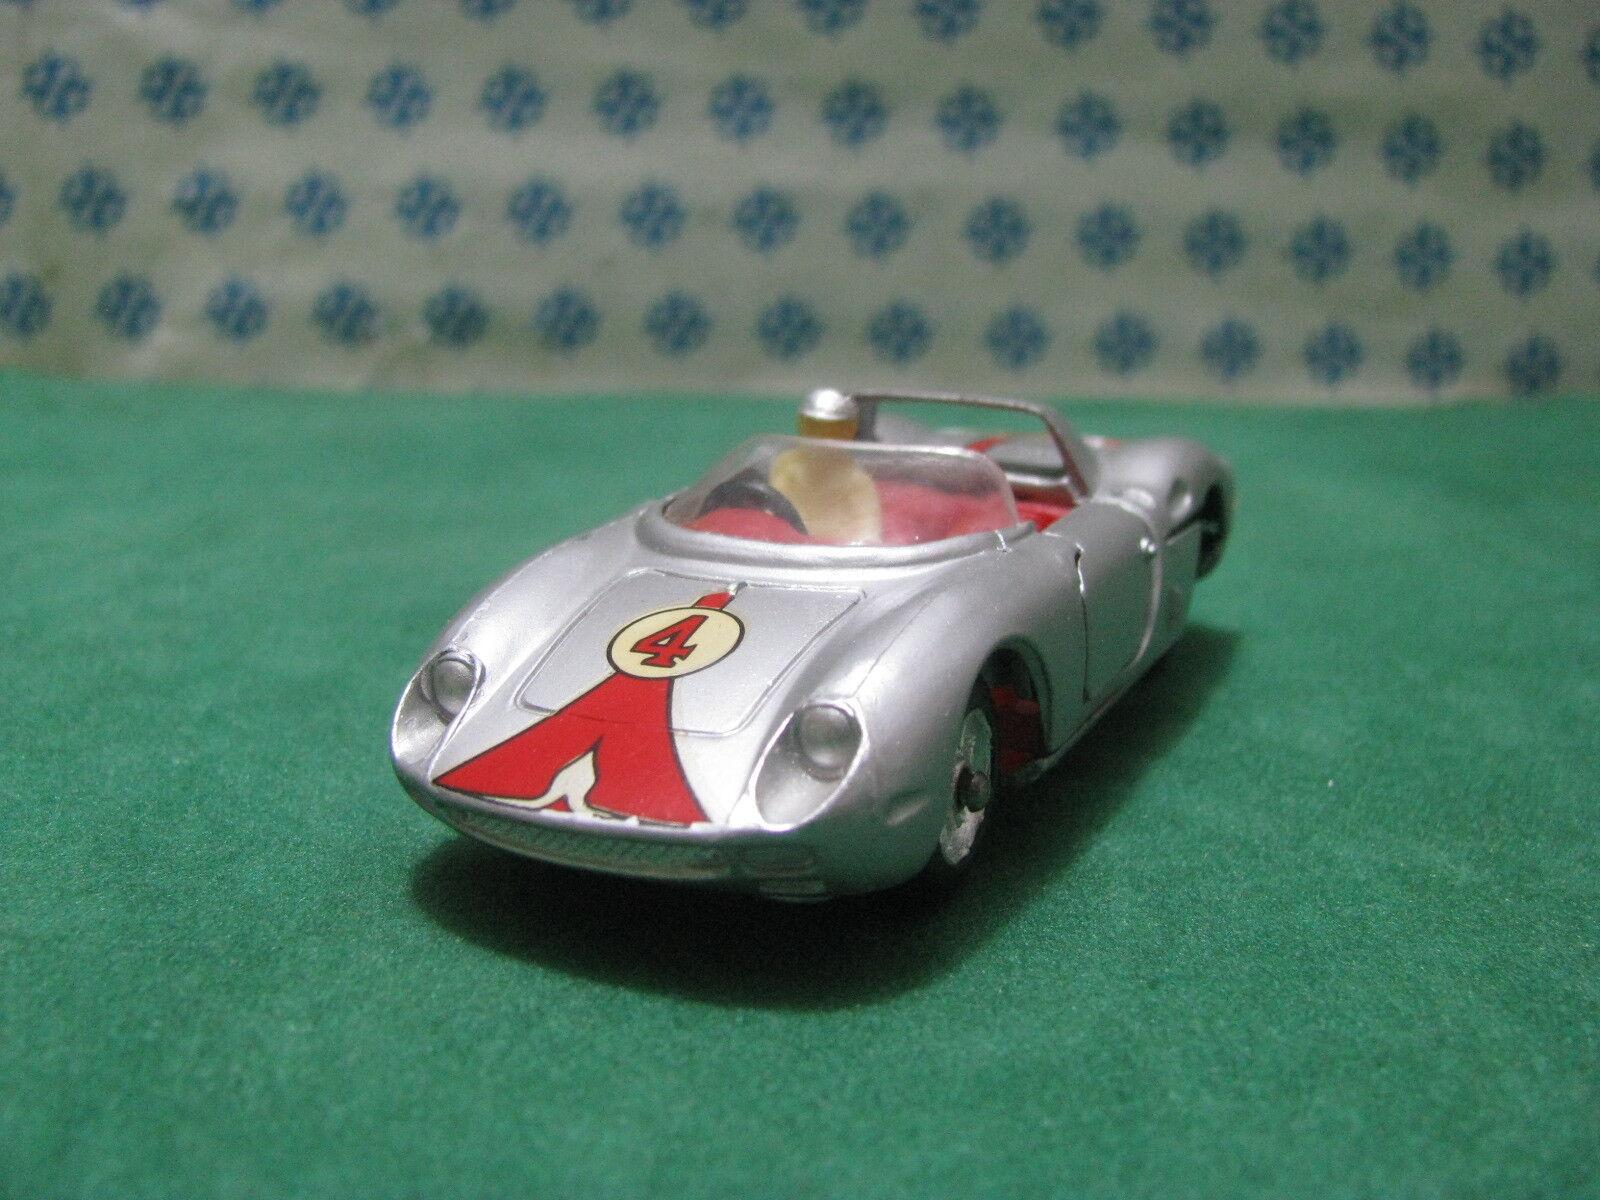 Vintage - FERRARI 330P Nurburgring - 1 43 Mercury Art. 60